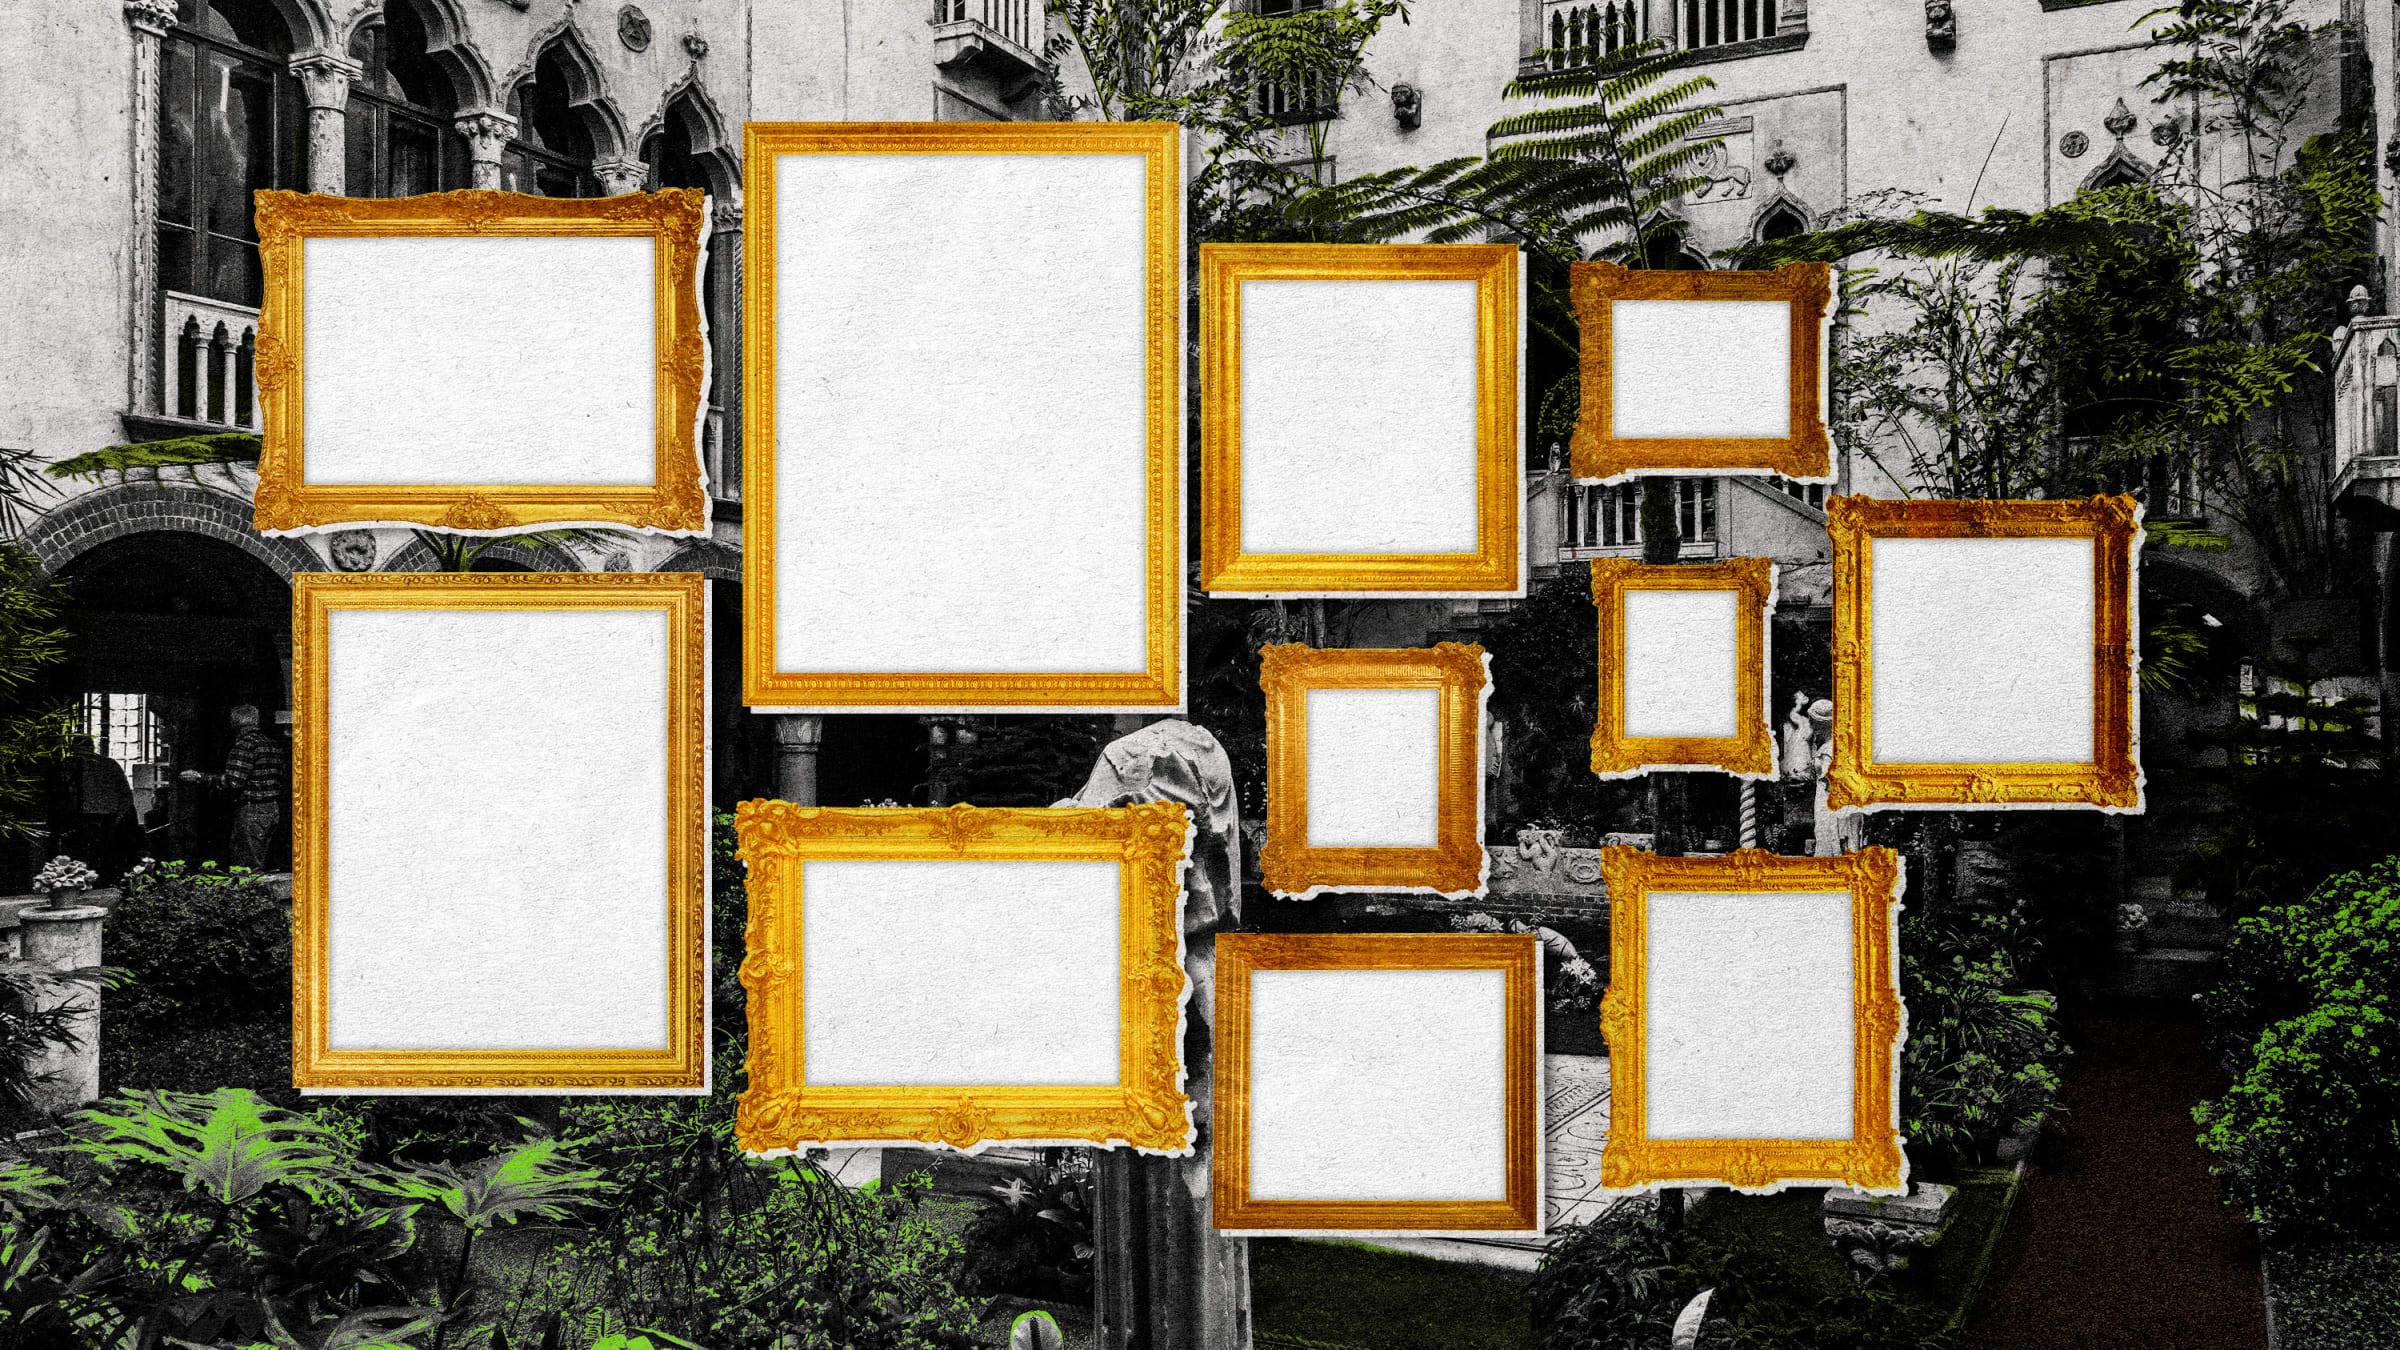 Did Whitey Bulger Pull Off the Isabella Stewart Gardner Museum Art Heist for the IRA?